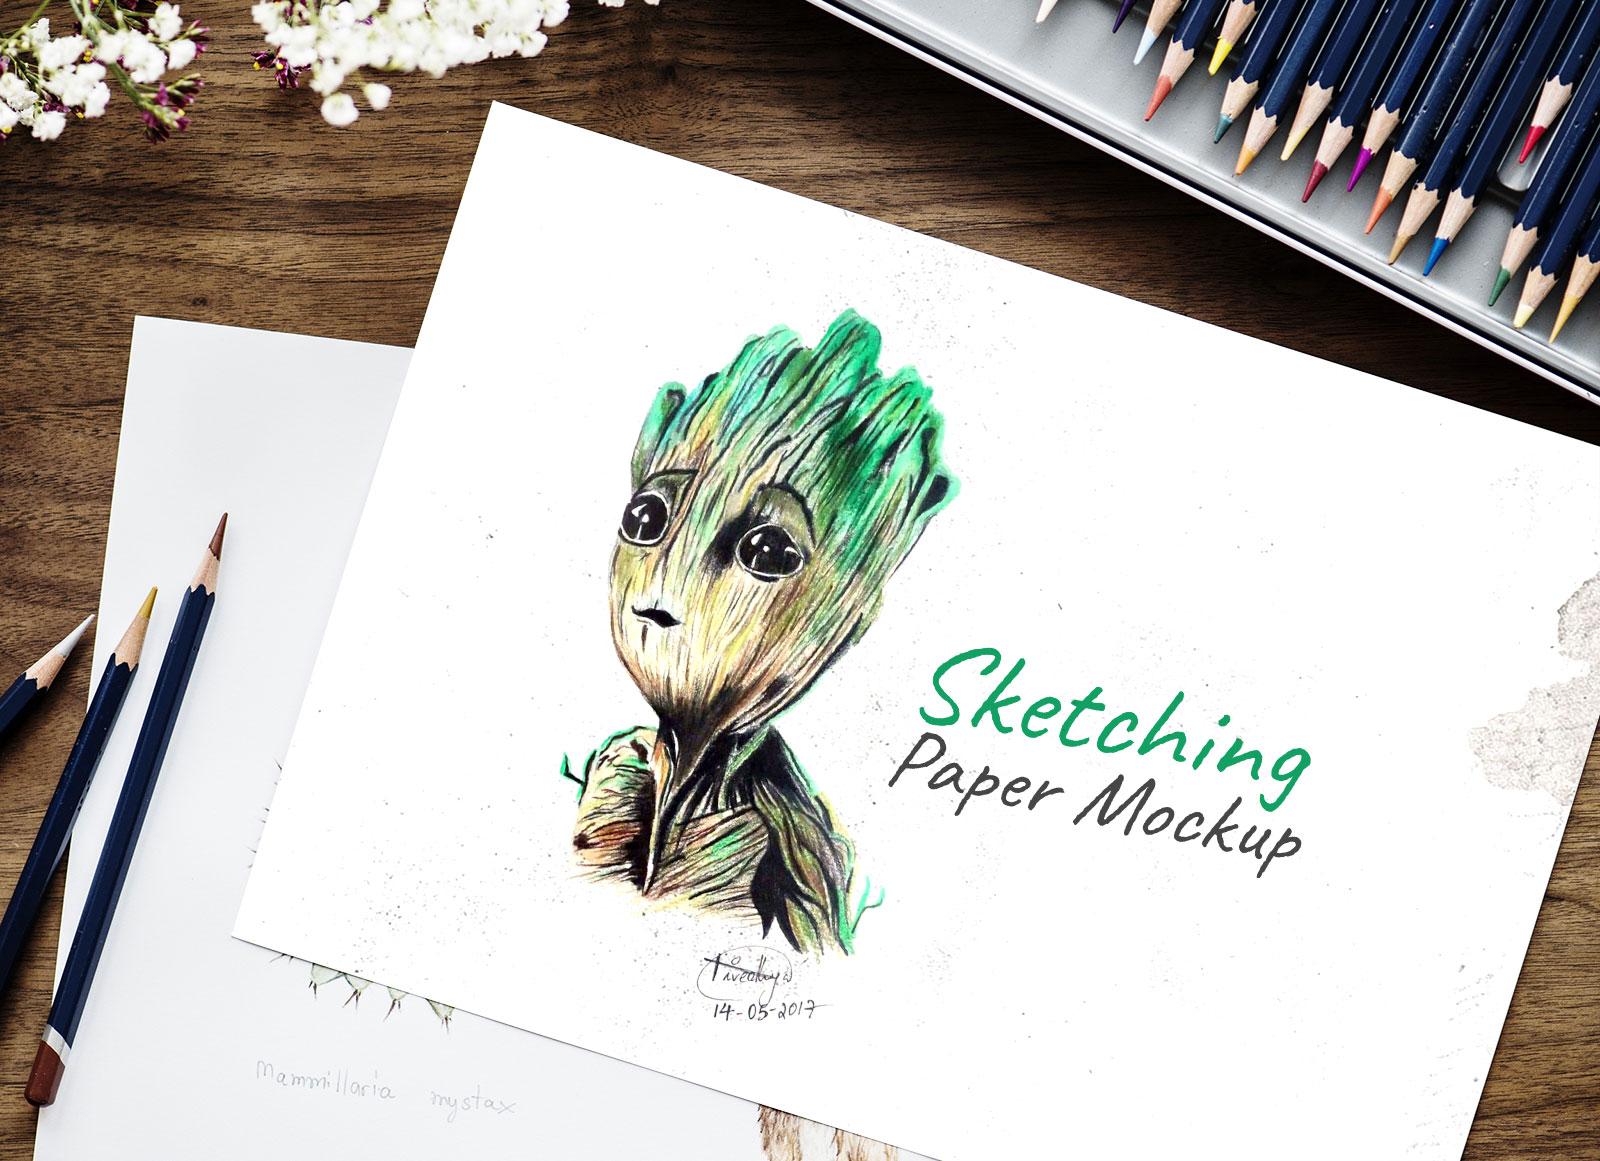 Free-Sketching-Drawing-Paper-Mockup-PSD